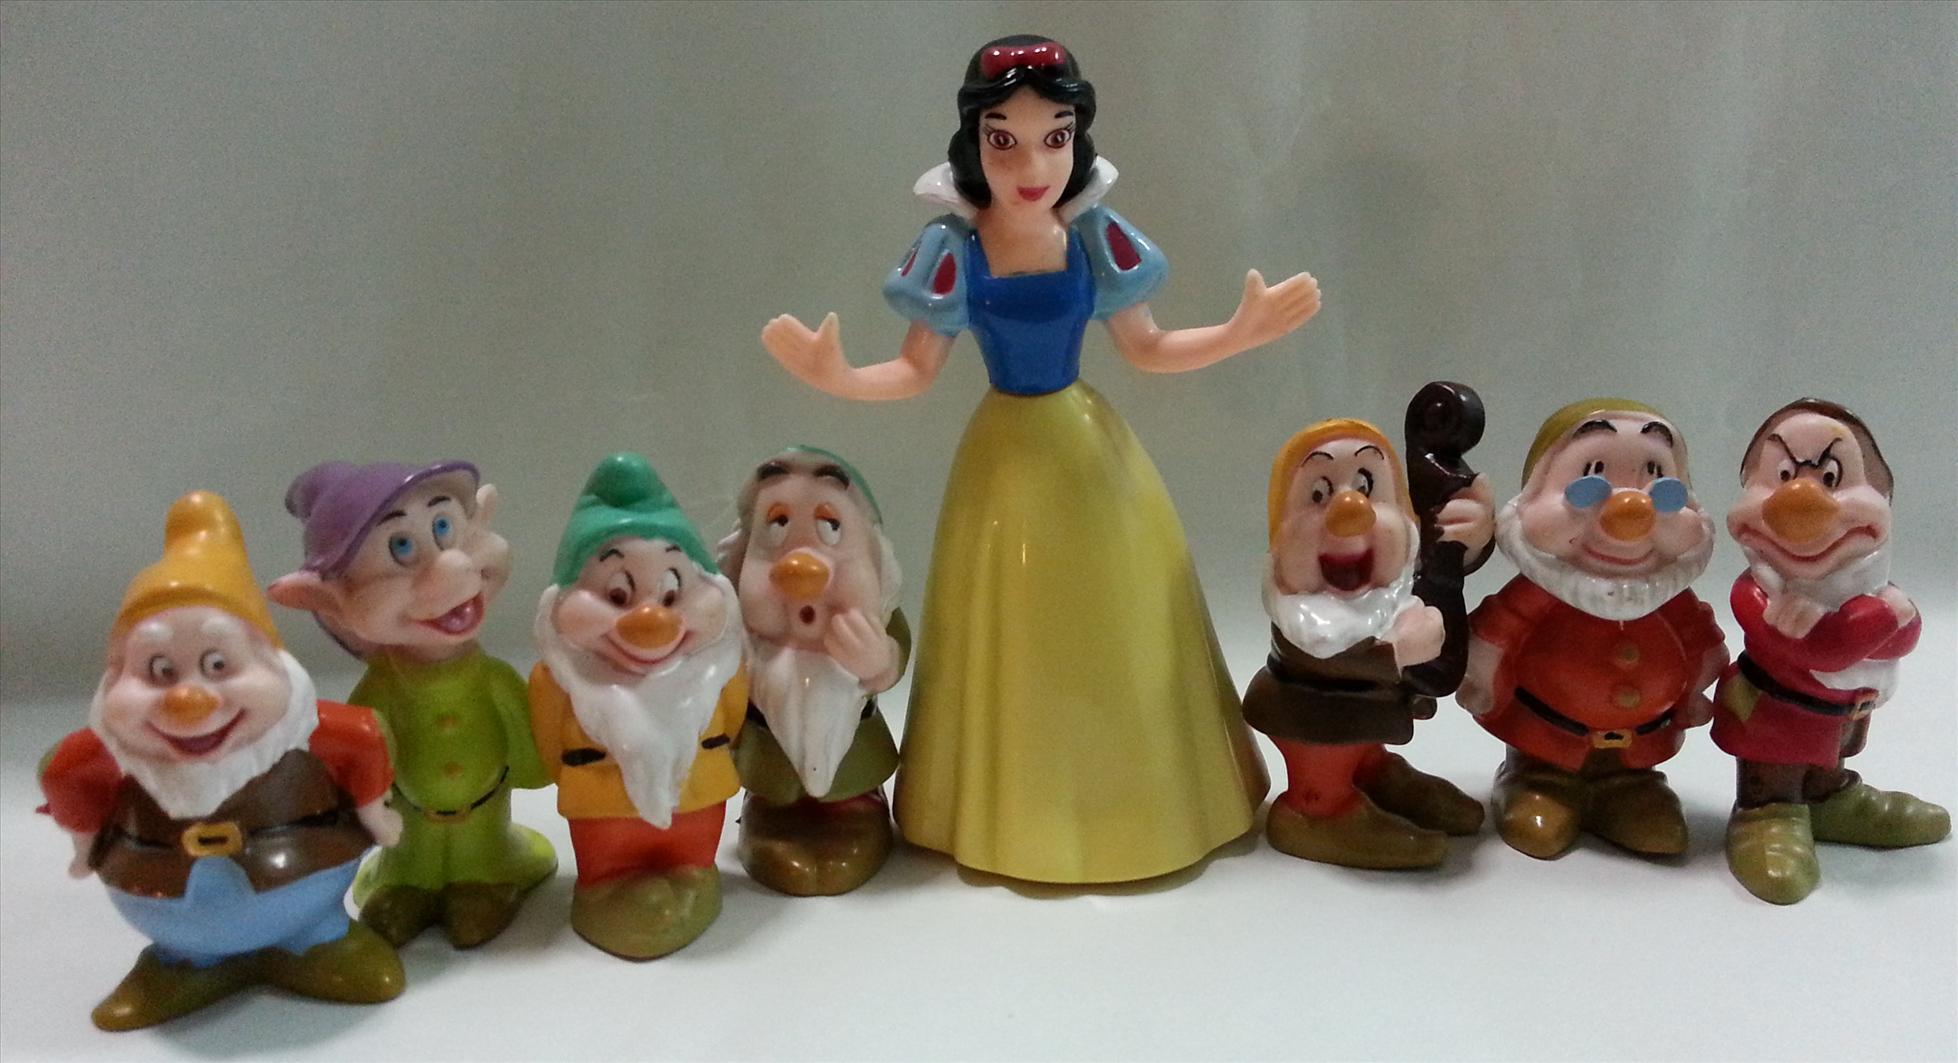 Snow White Seven Dwarfs Cake Toppers